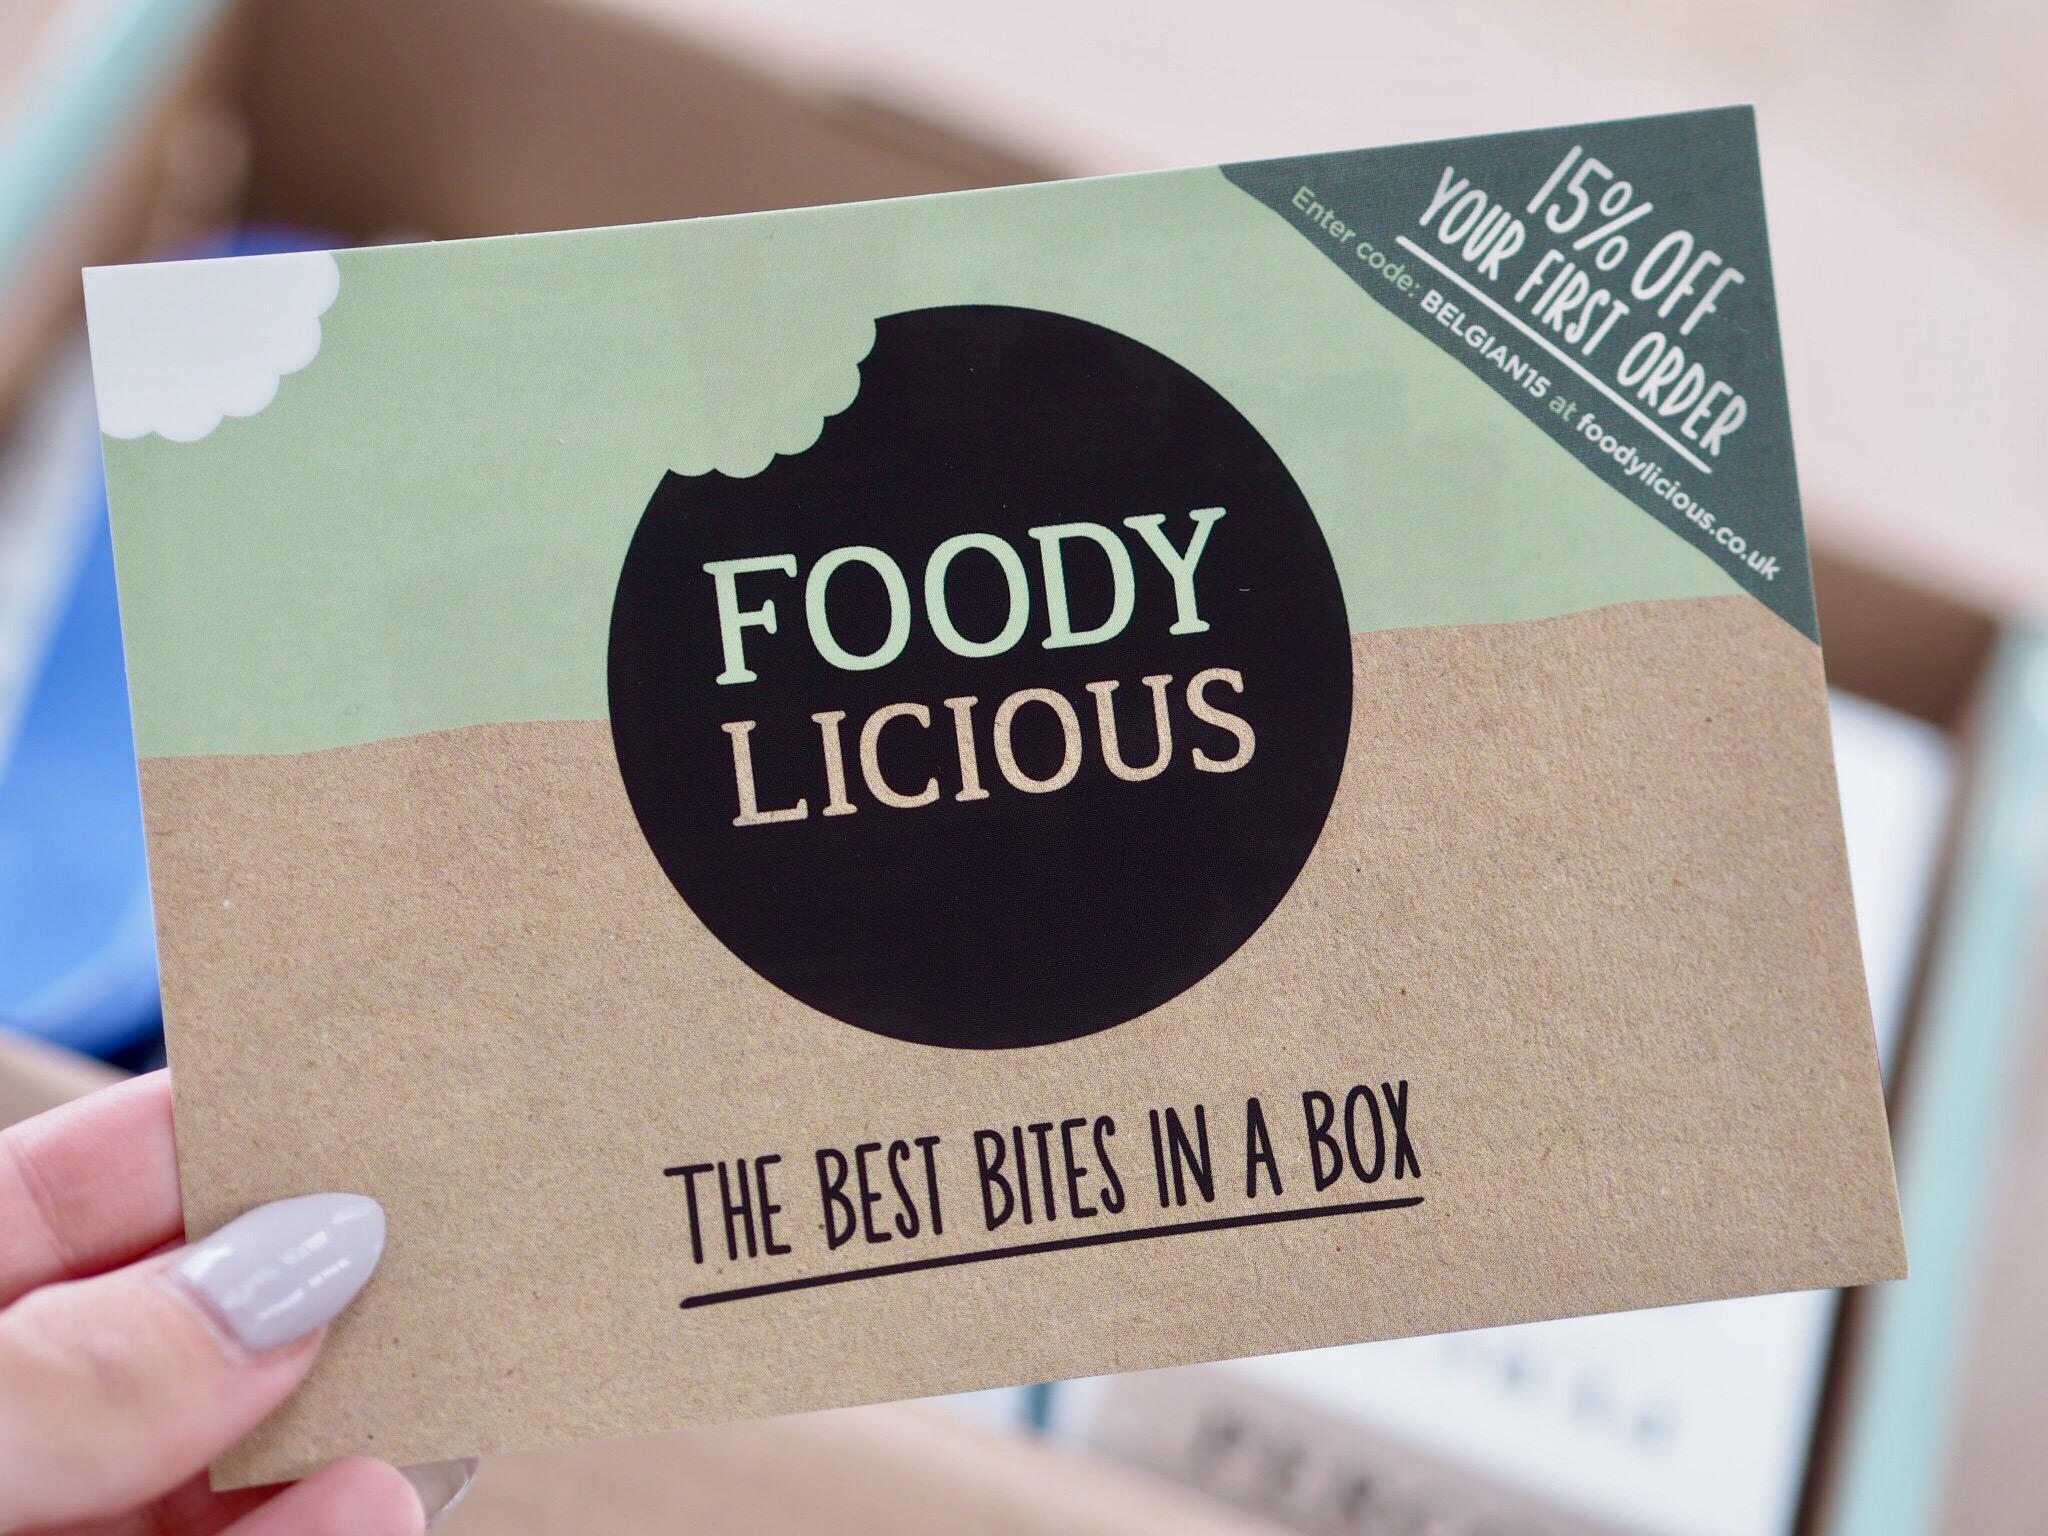 Foodylicious